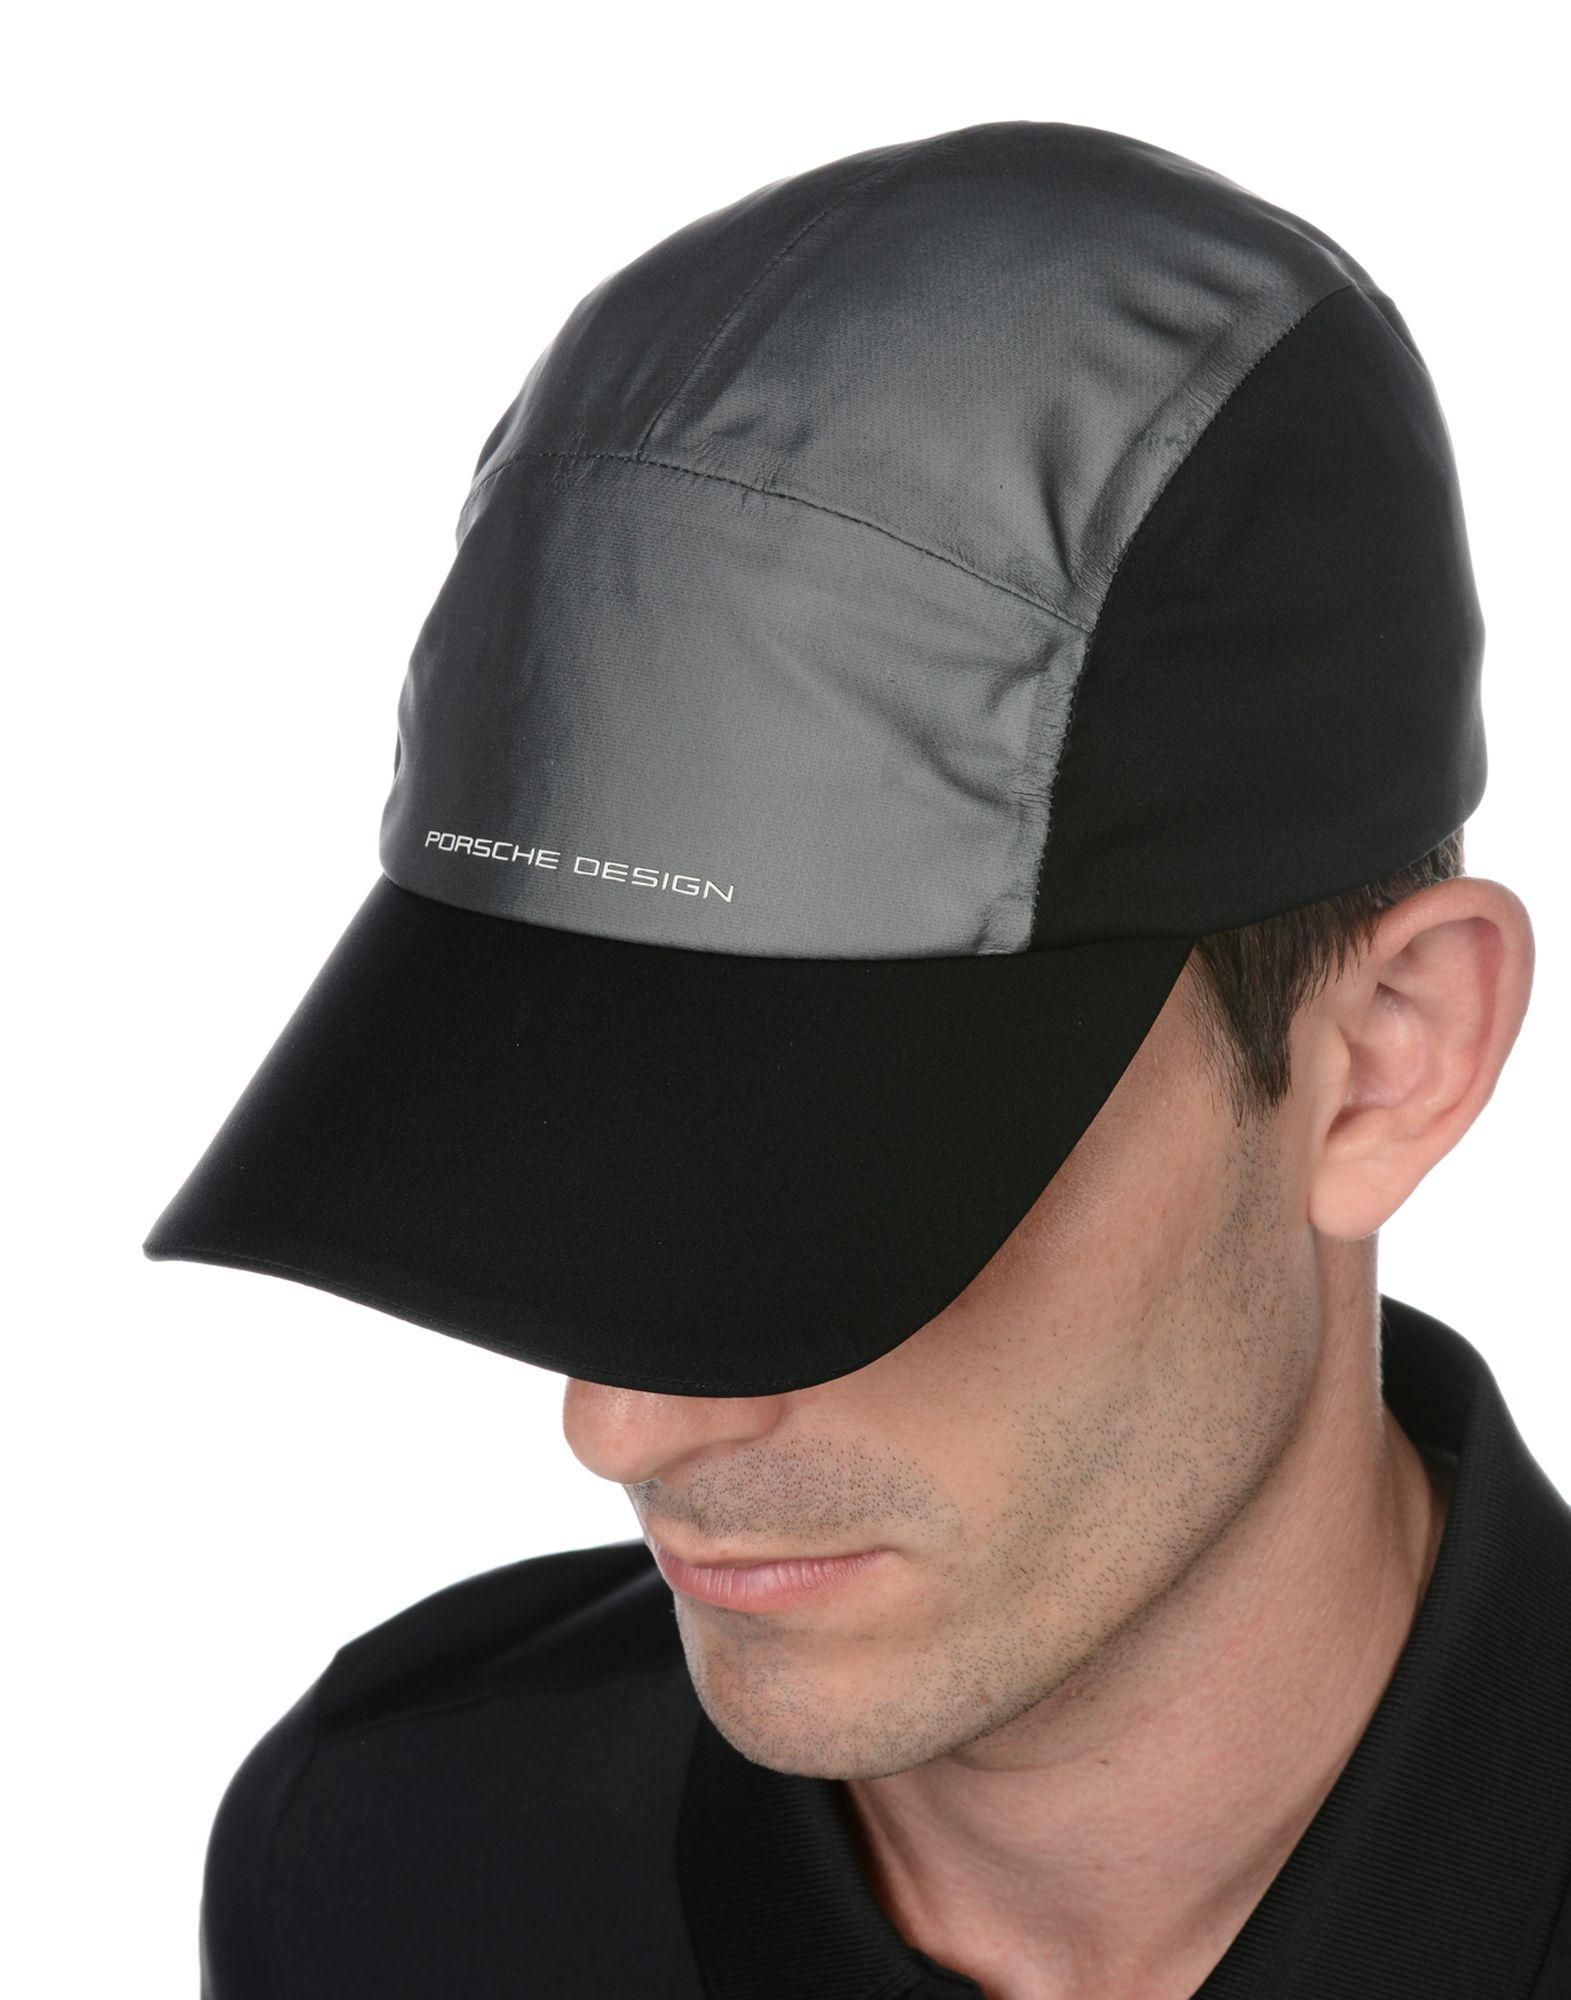 best sneakers 2bbb5 8e1c8 Lyst - Porsche Design Hat in Black for Men